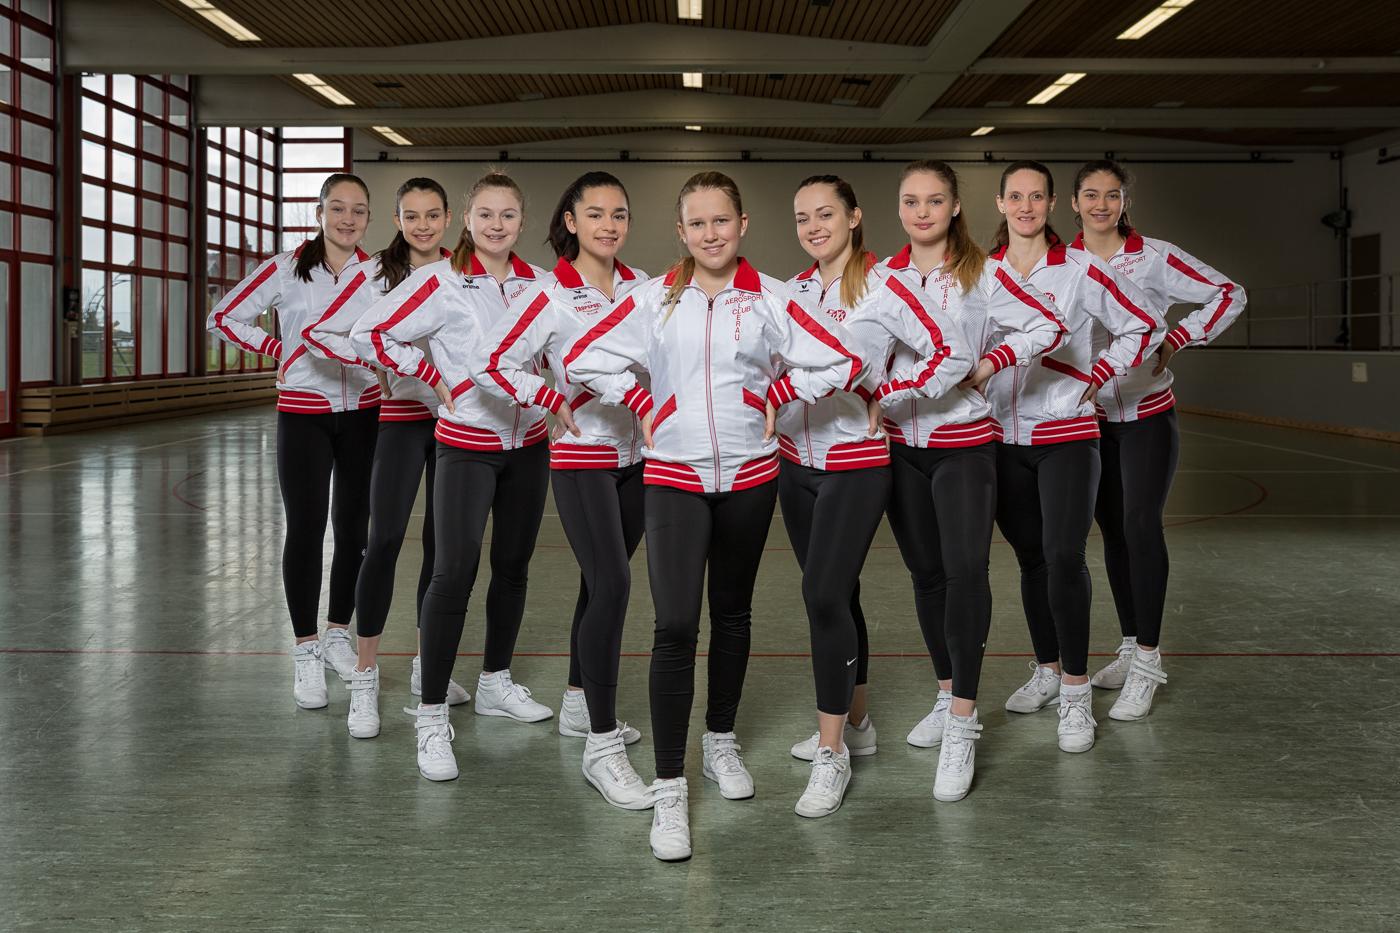 sport-teamfotos-teambilder-fotograf-schweiz